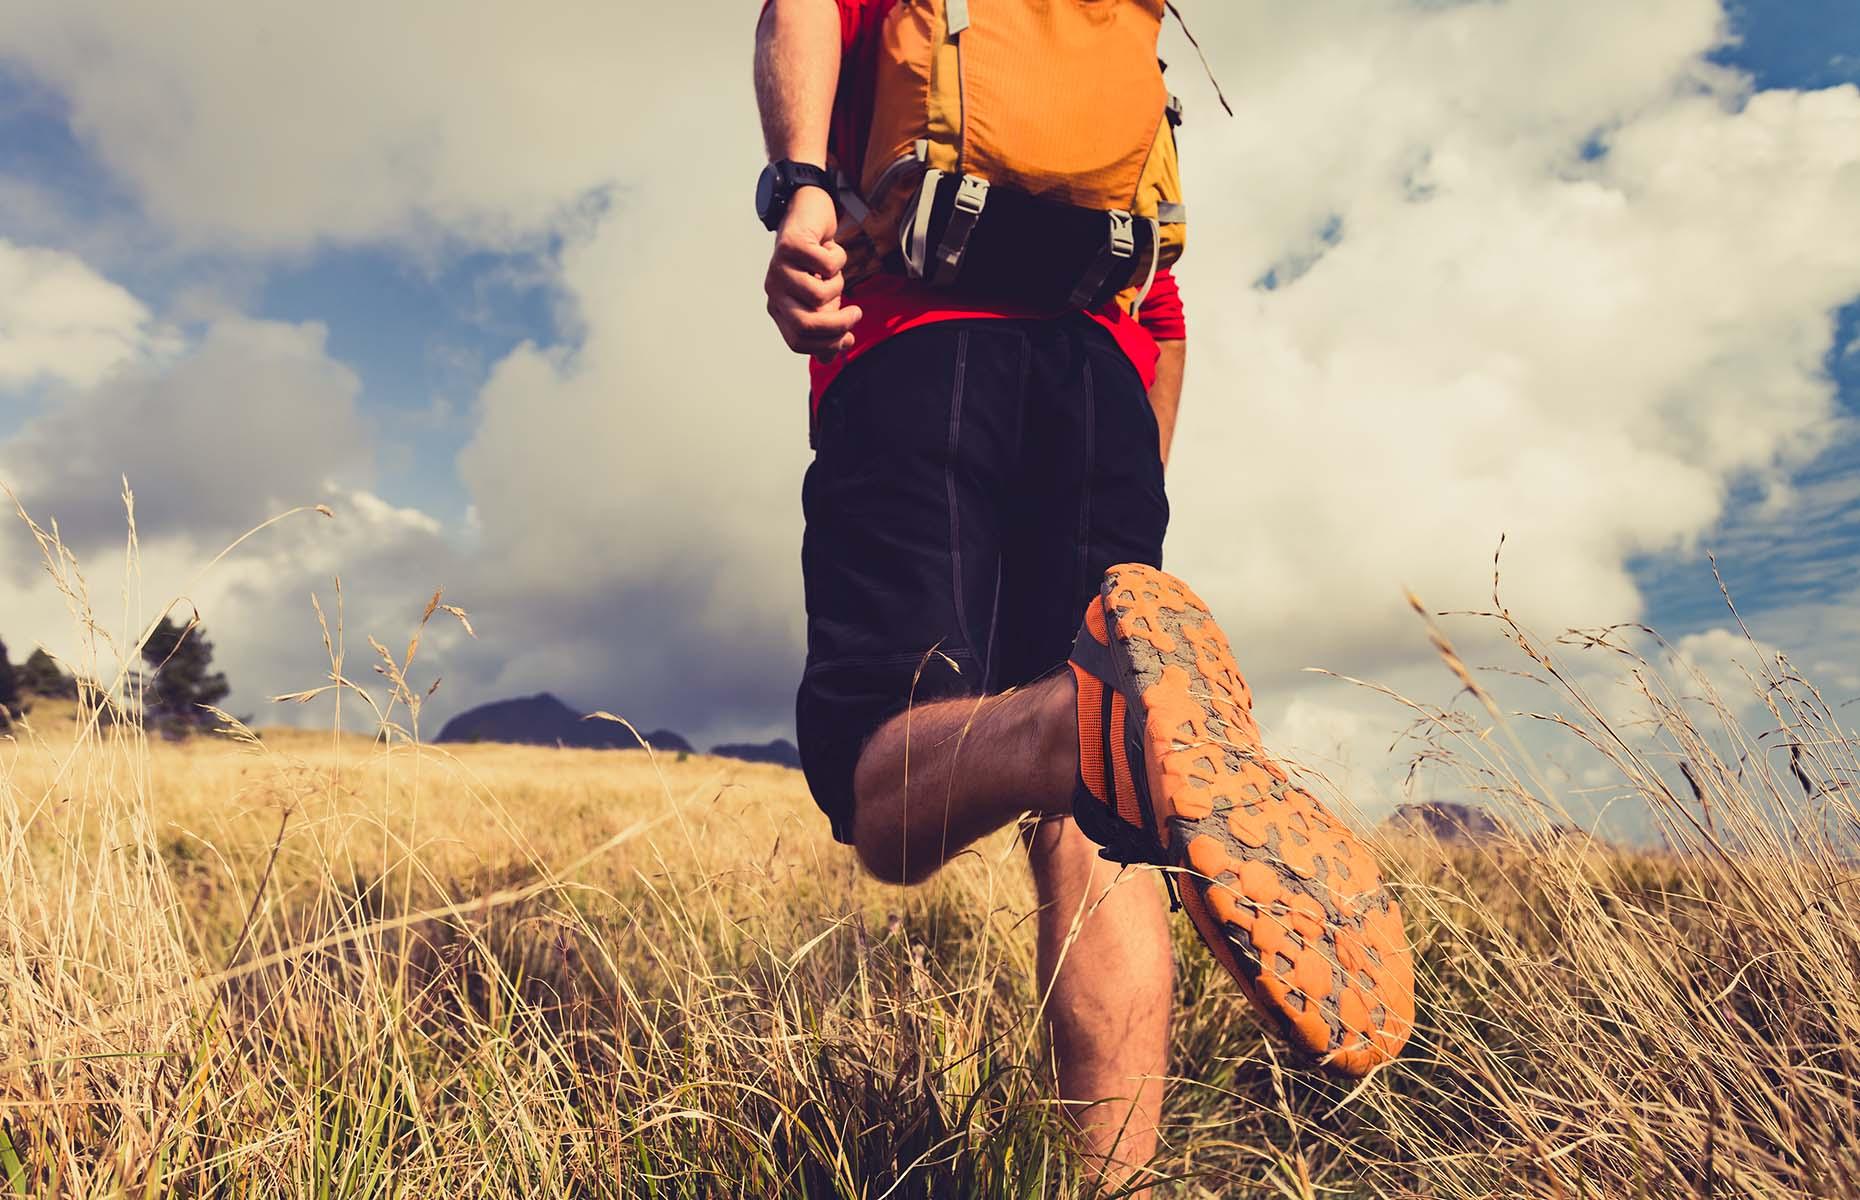 Go on a multi-day running journey (Image: Blazej Lyjak/Shutterstock)